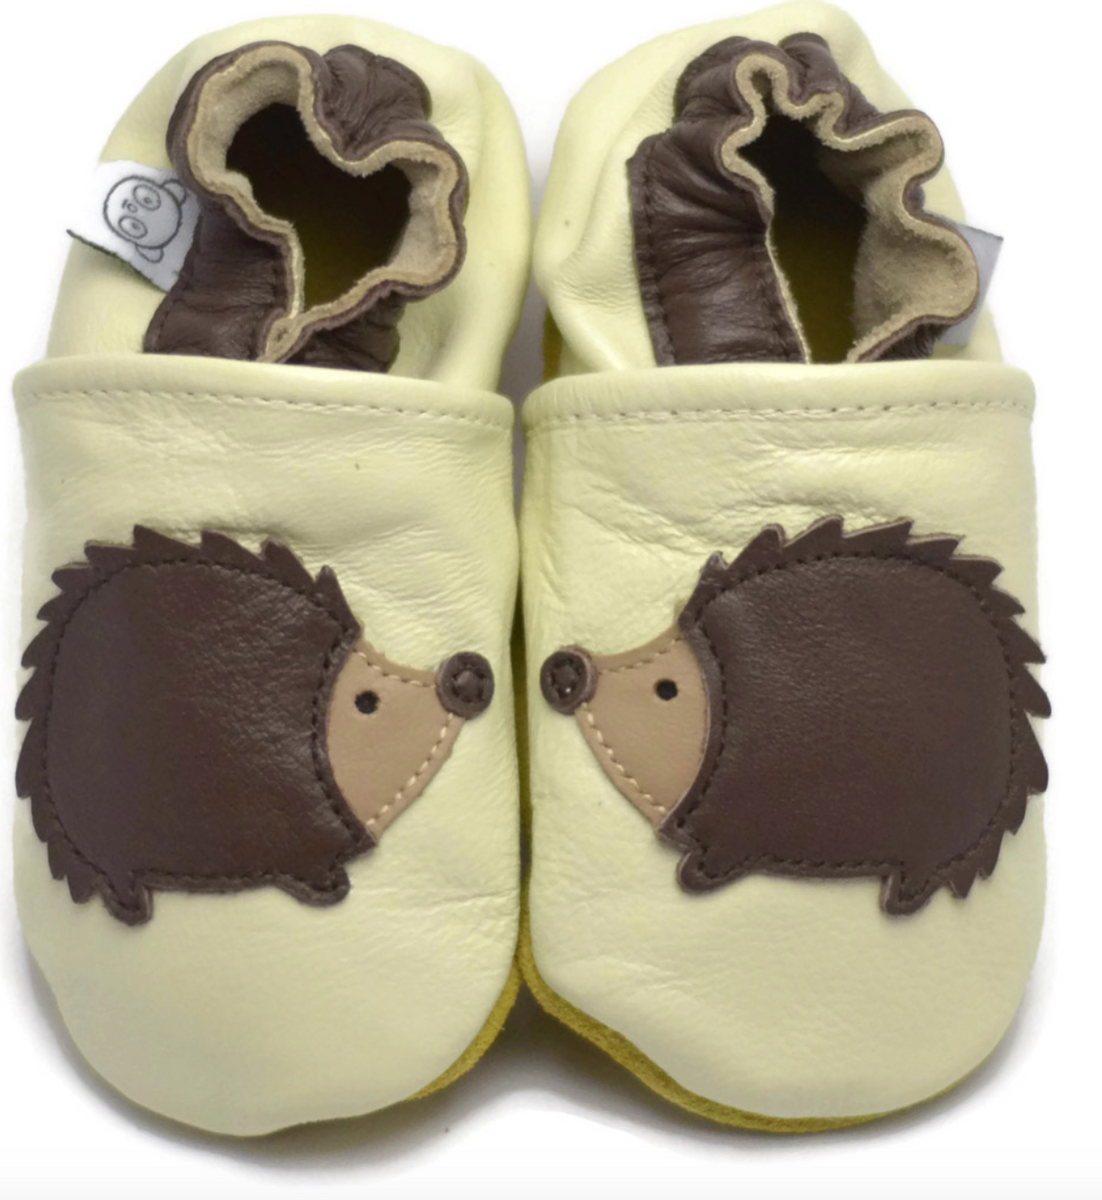 Tøffel pinnsvin creme panda feet